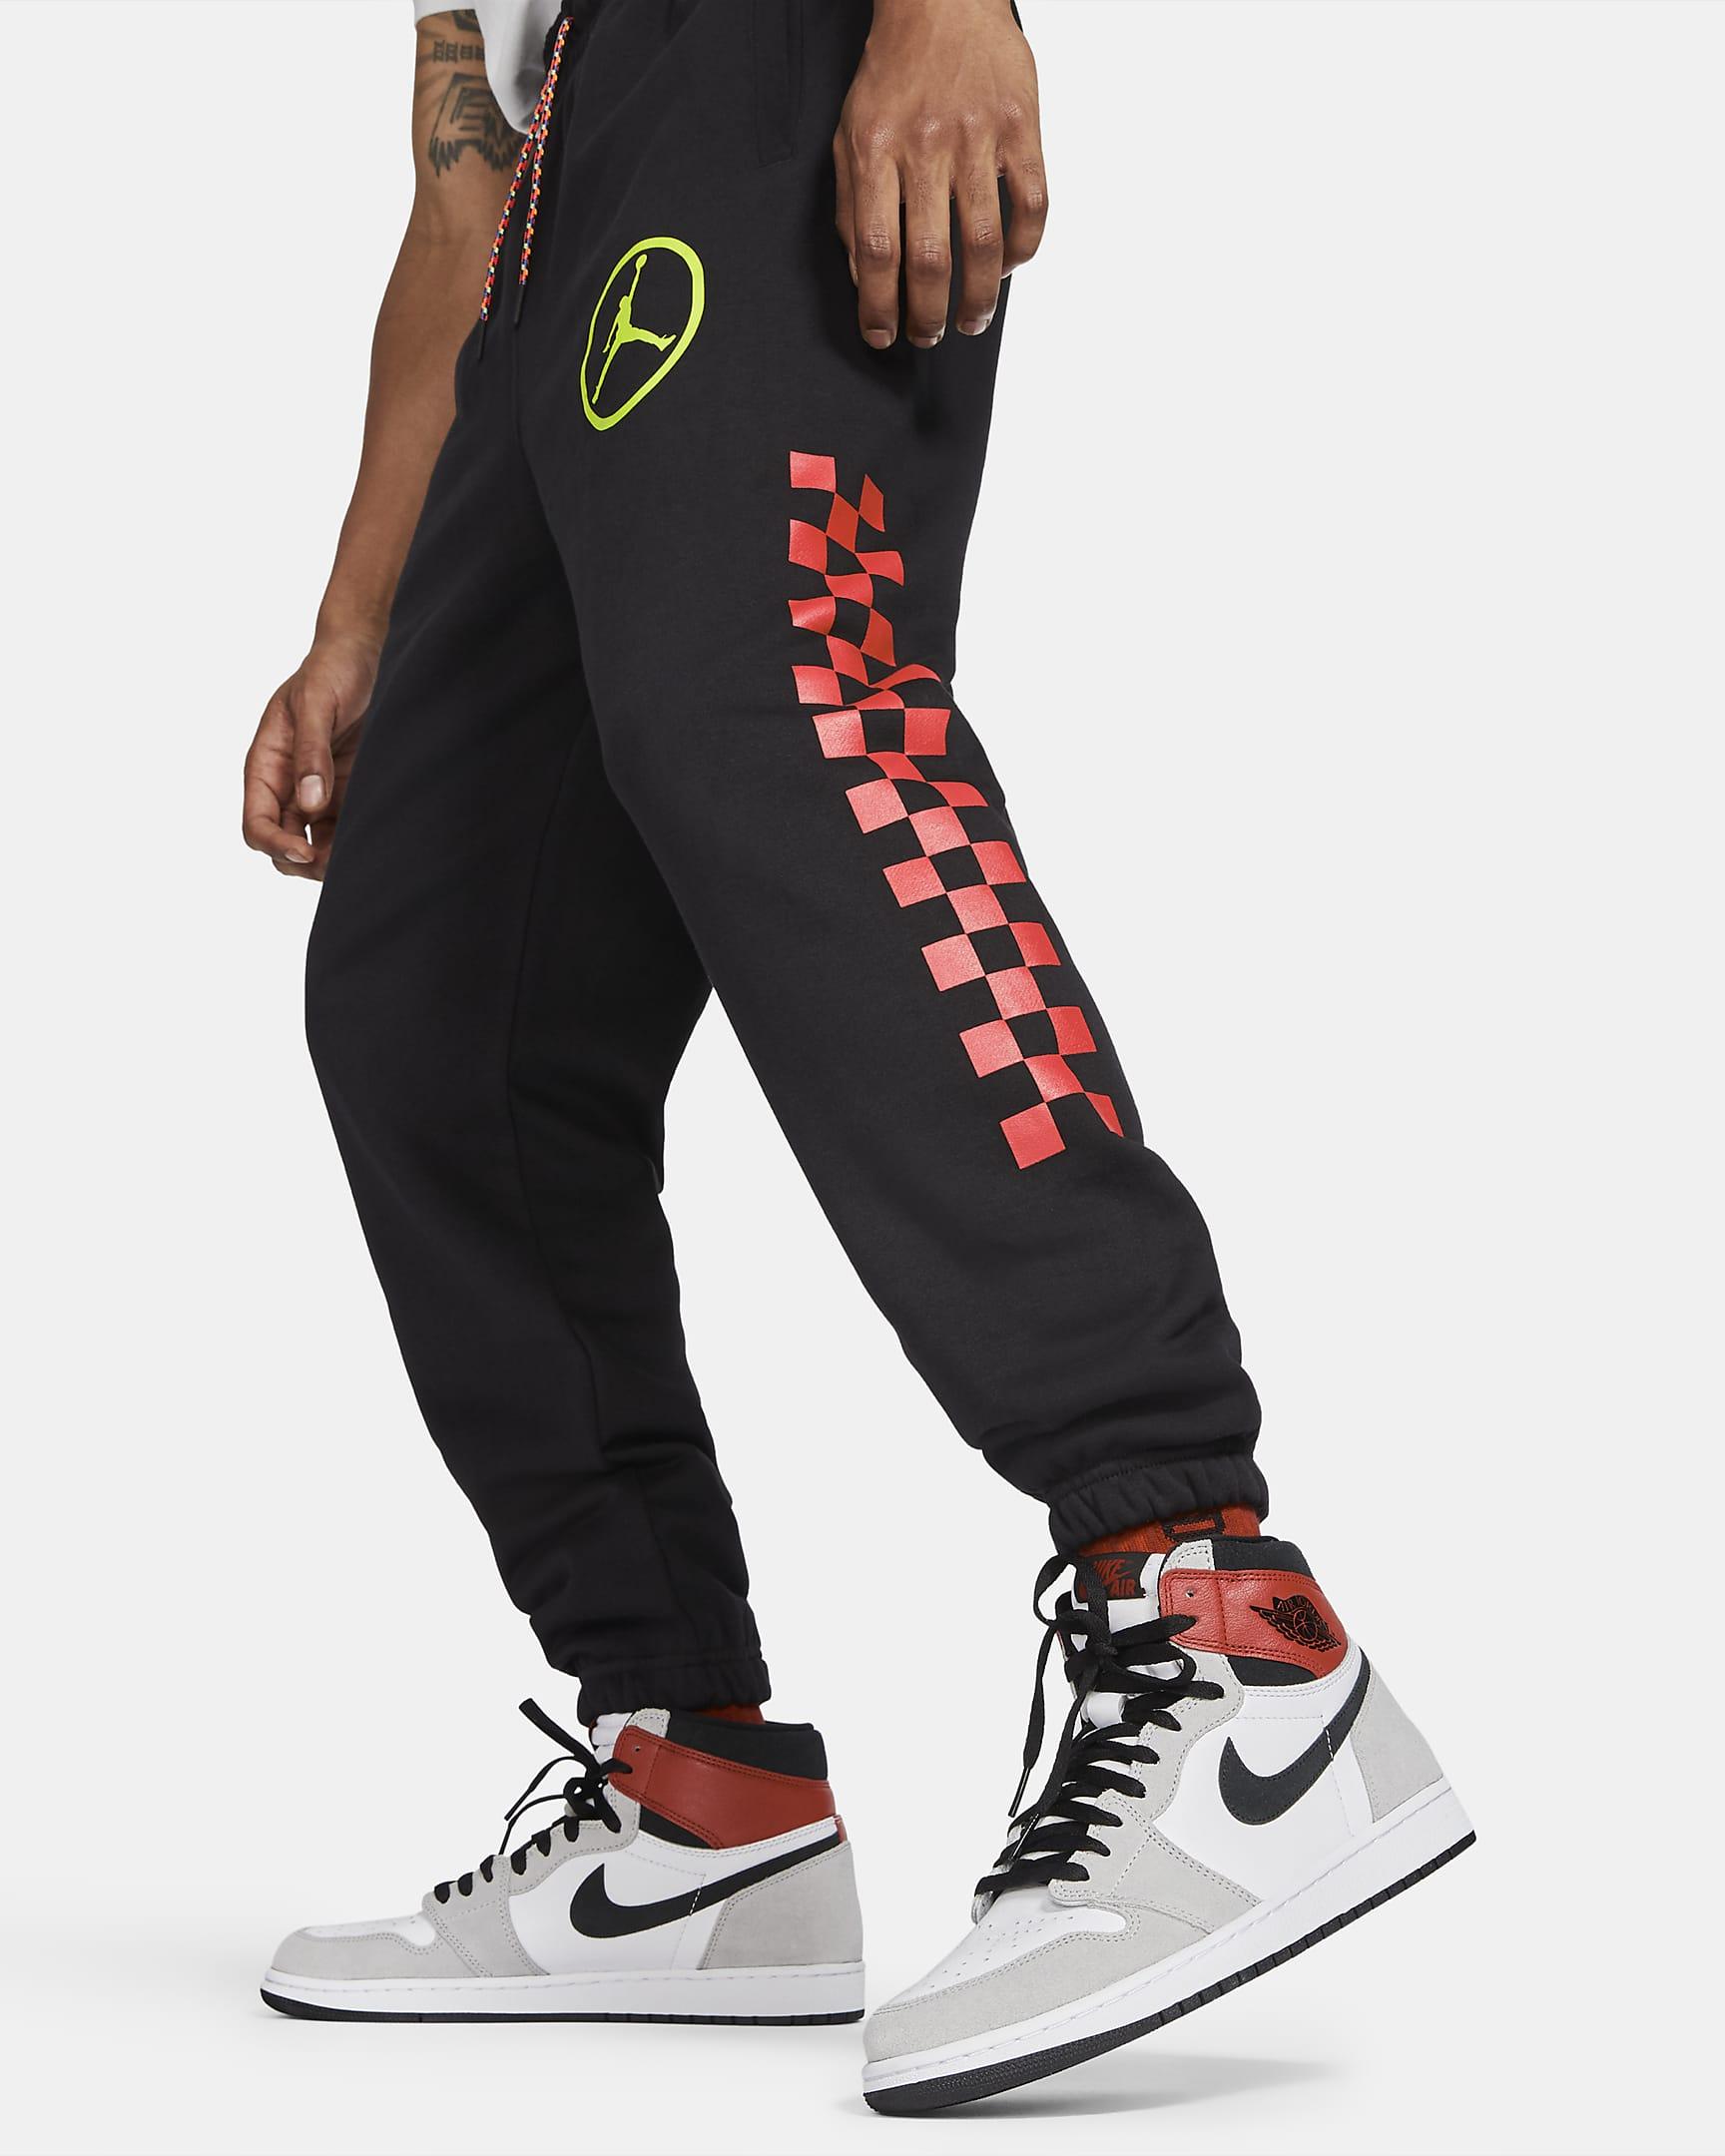 jordan-sport-dna-mens-fleece-pants-k7jS82-4